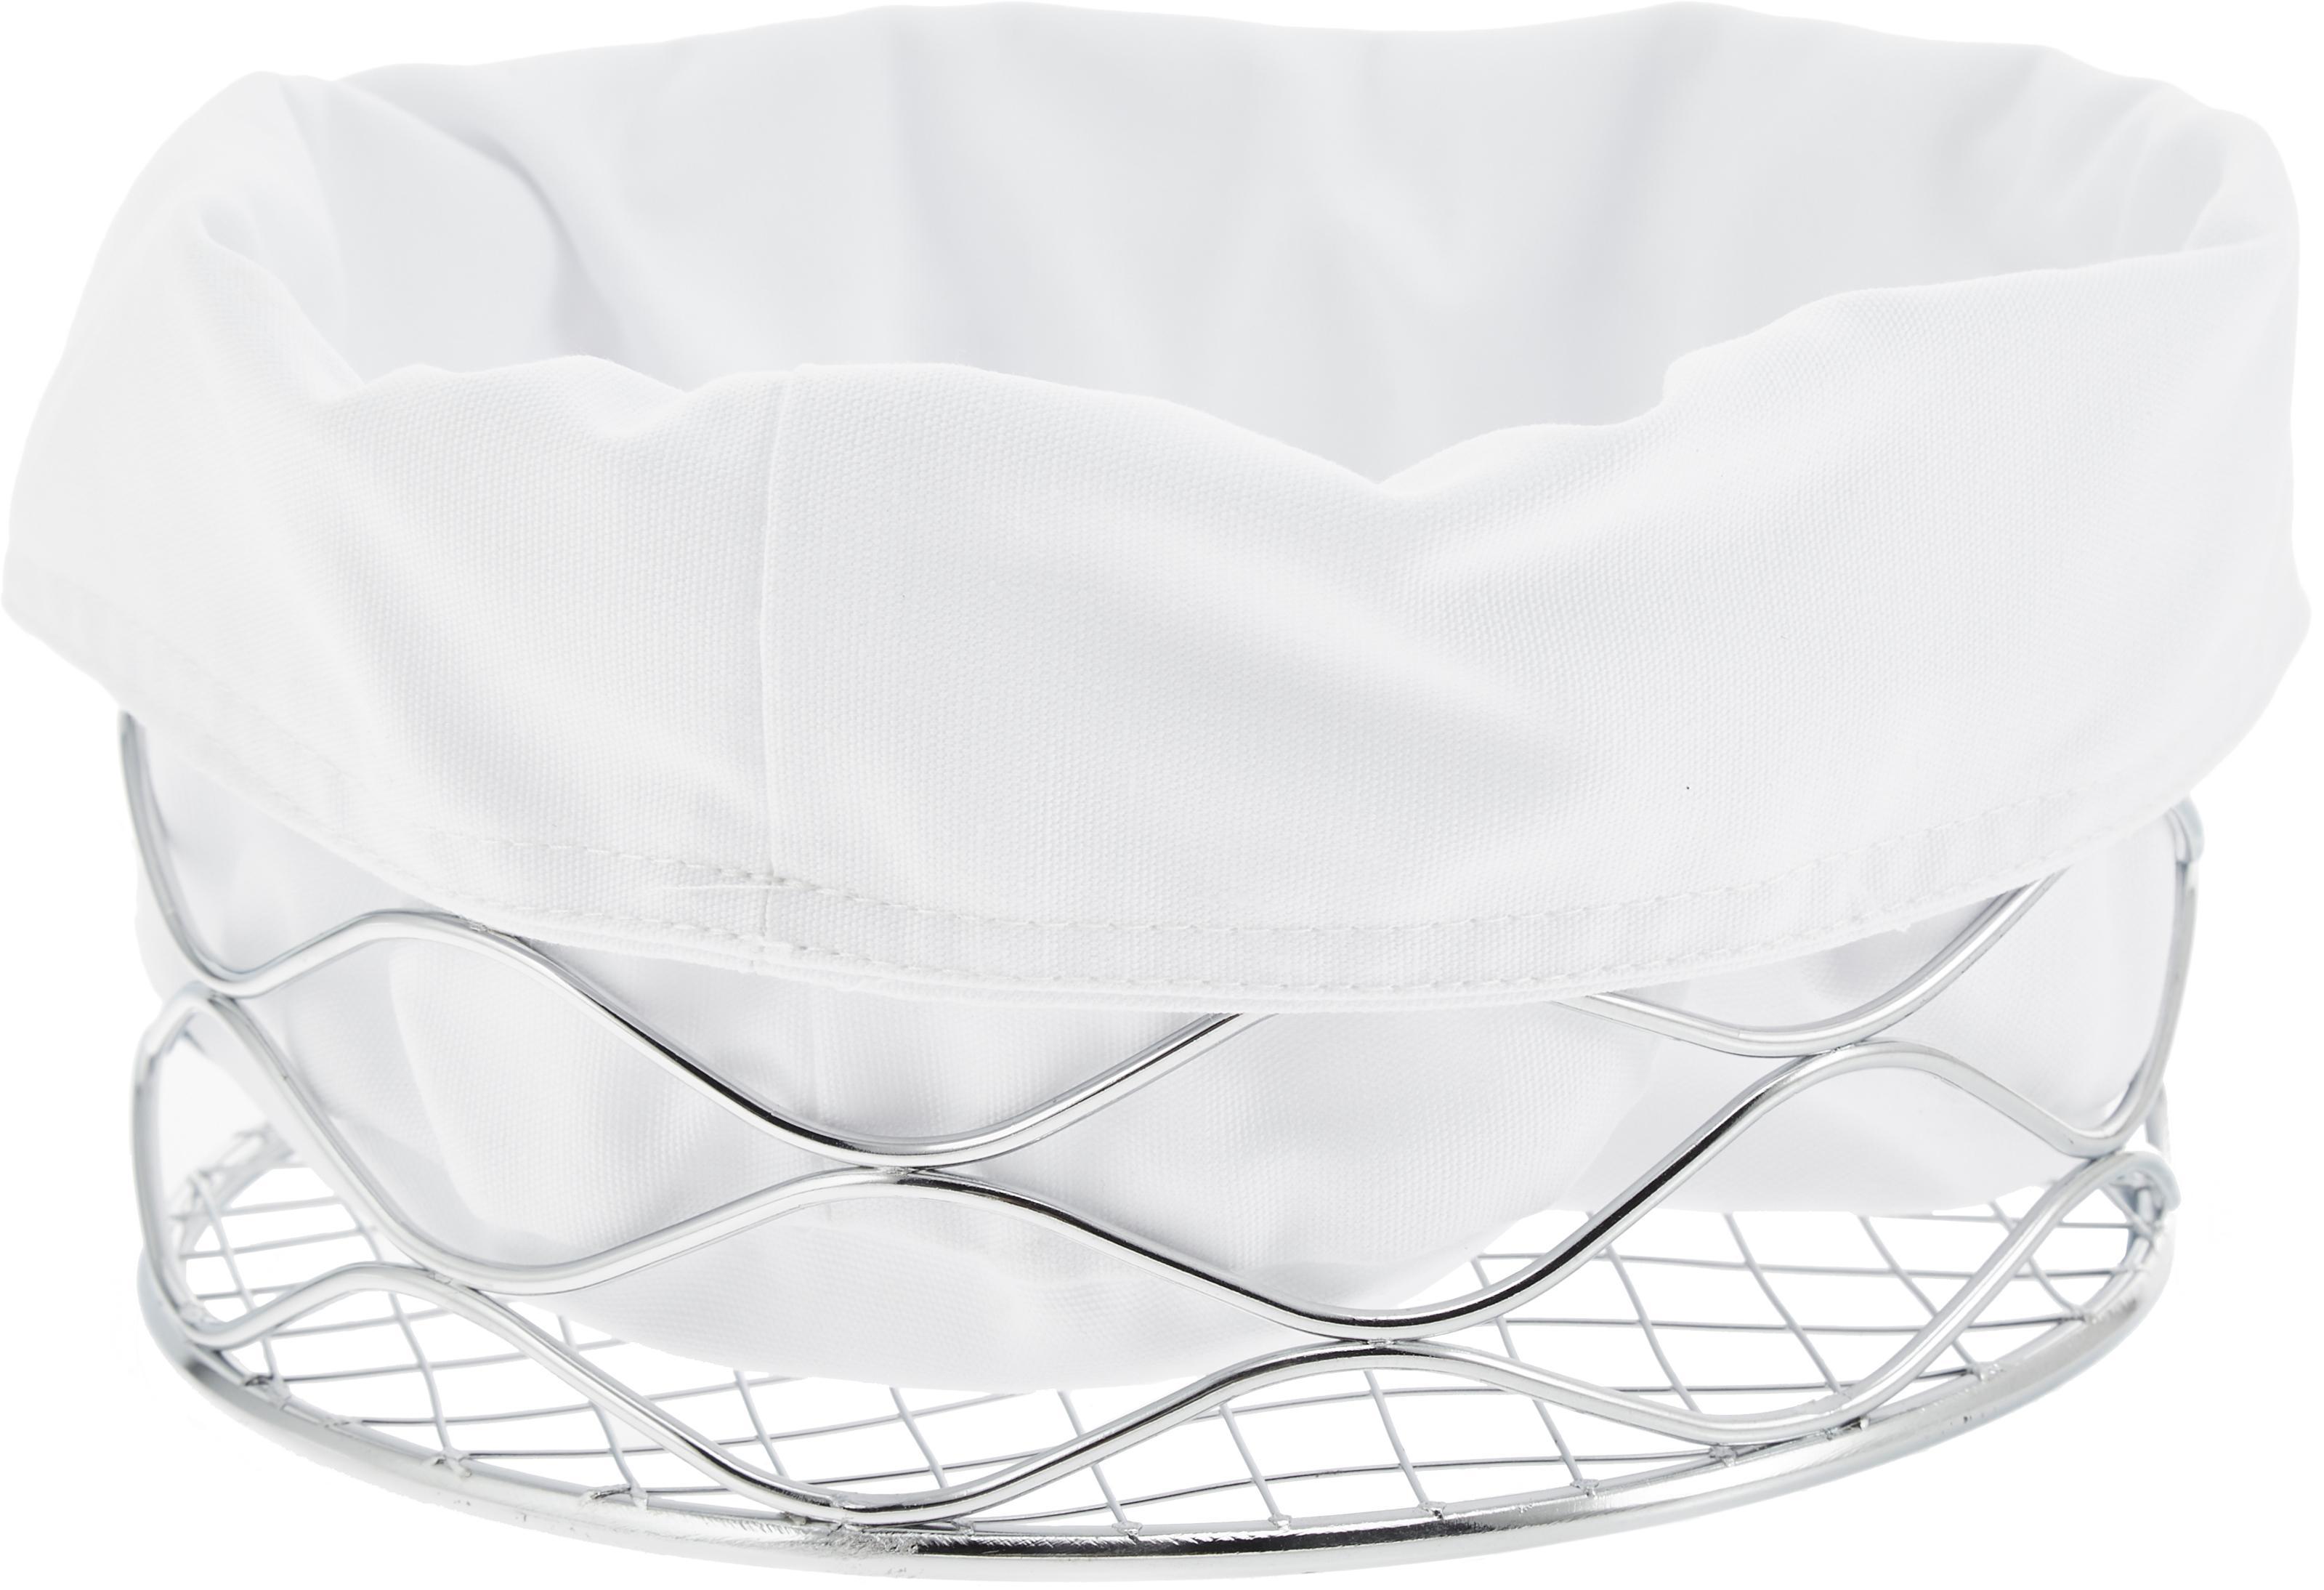 Cestino per pane Alana, Cromo, bianco, Ø 21 x 11 cm